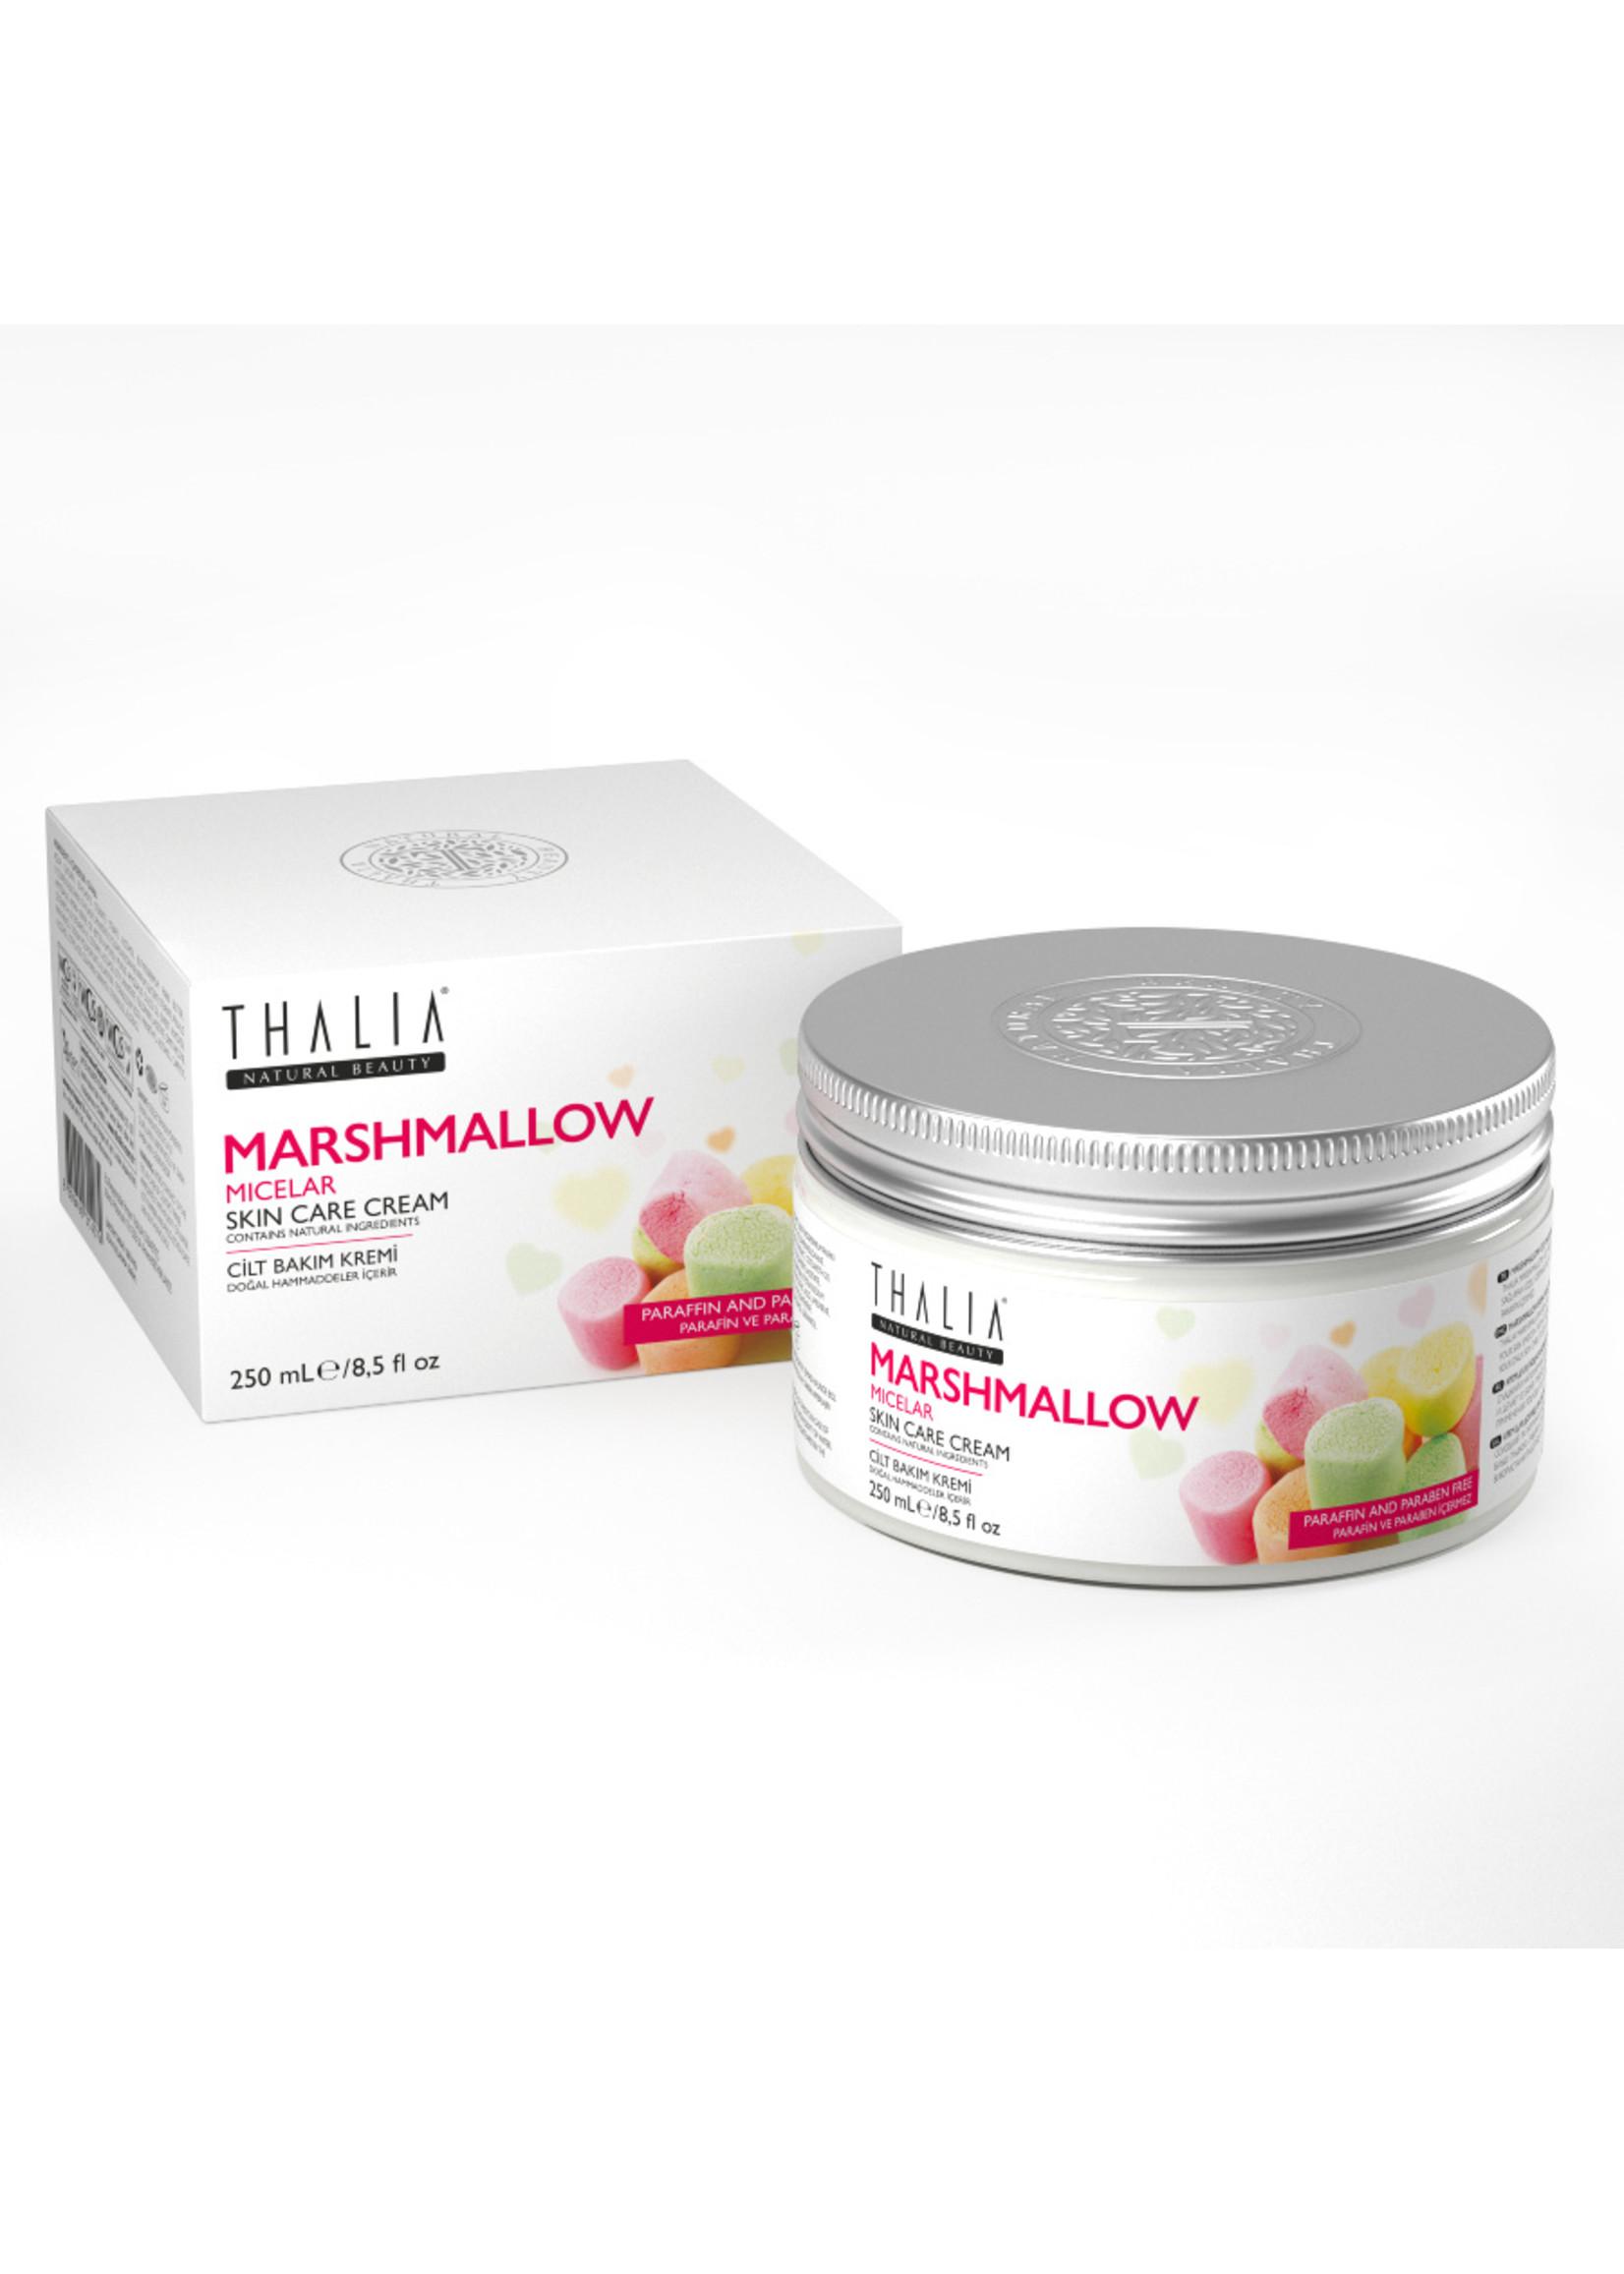 Thalia Marshmallow Skin Care Cream - 250 ml